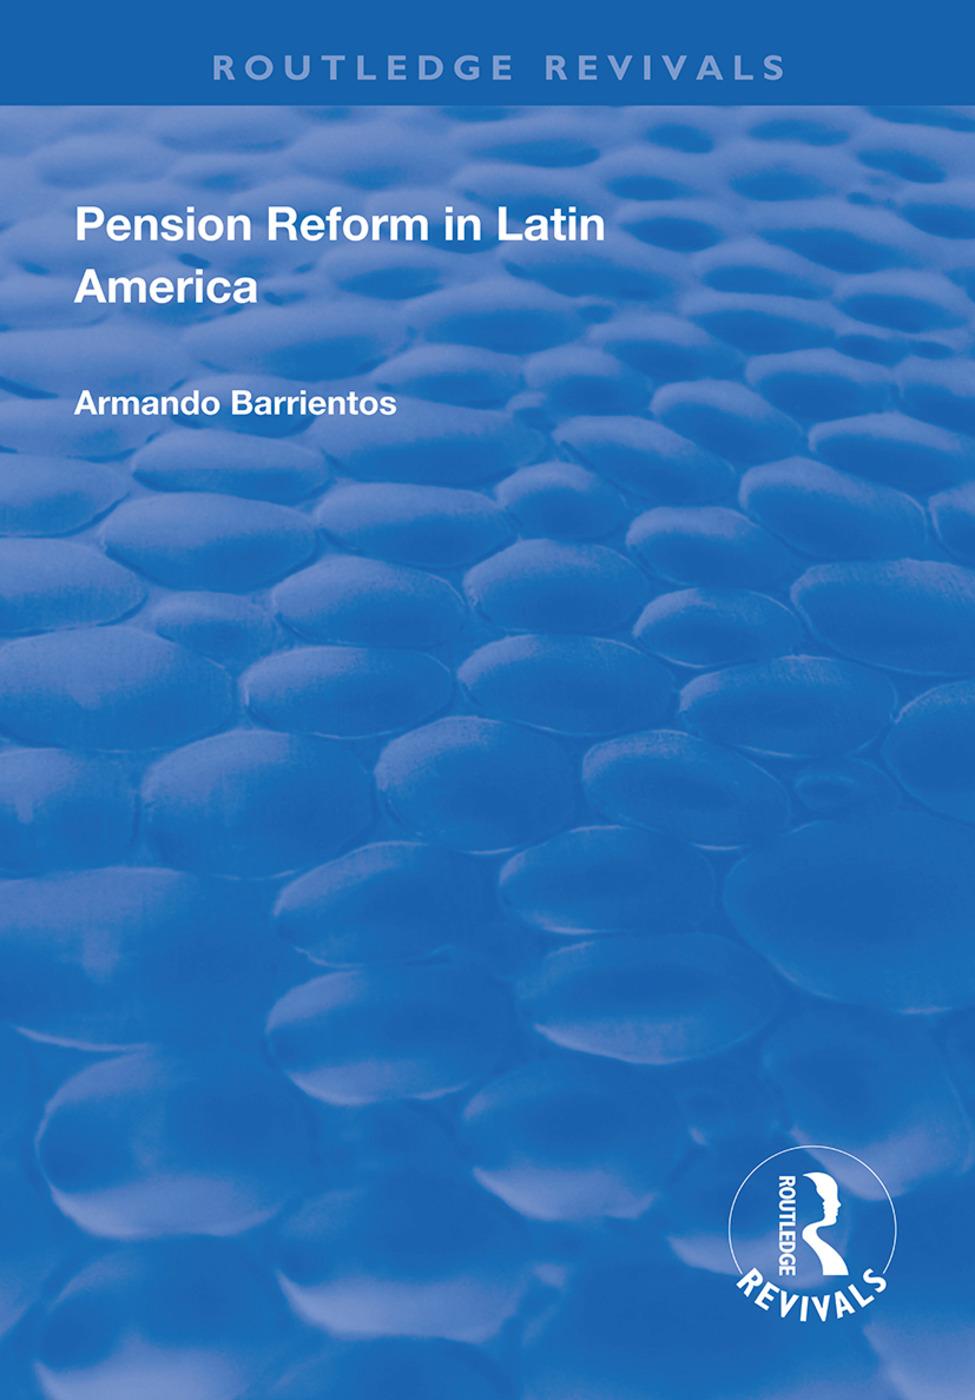 Pension Reform in Latin America